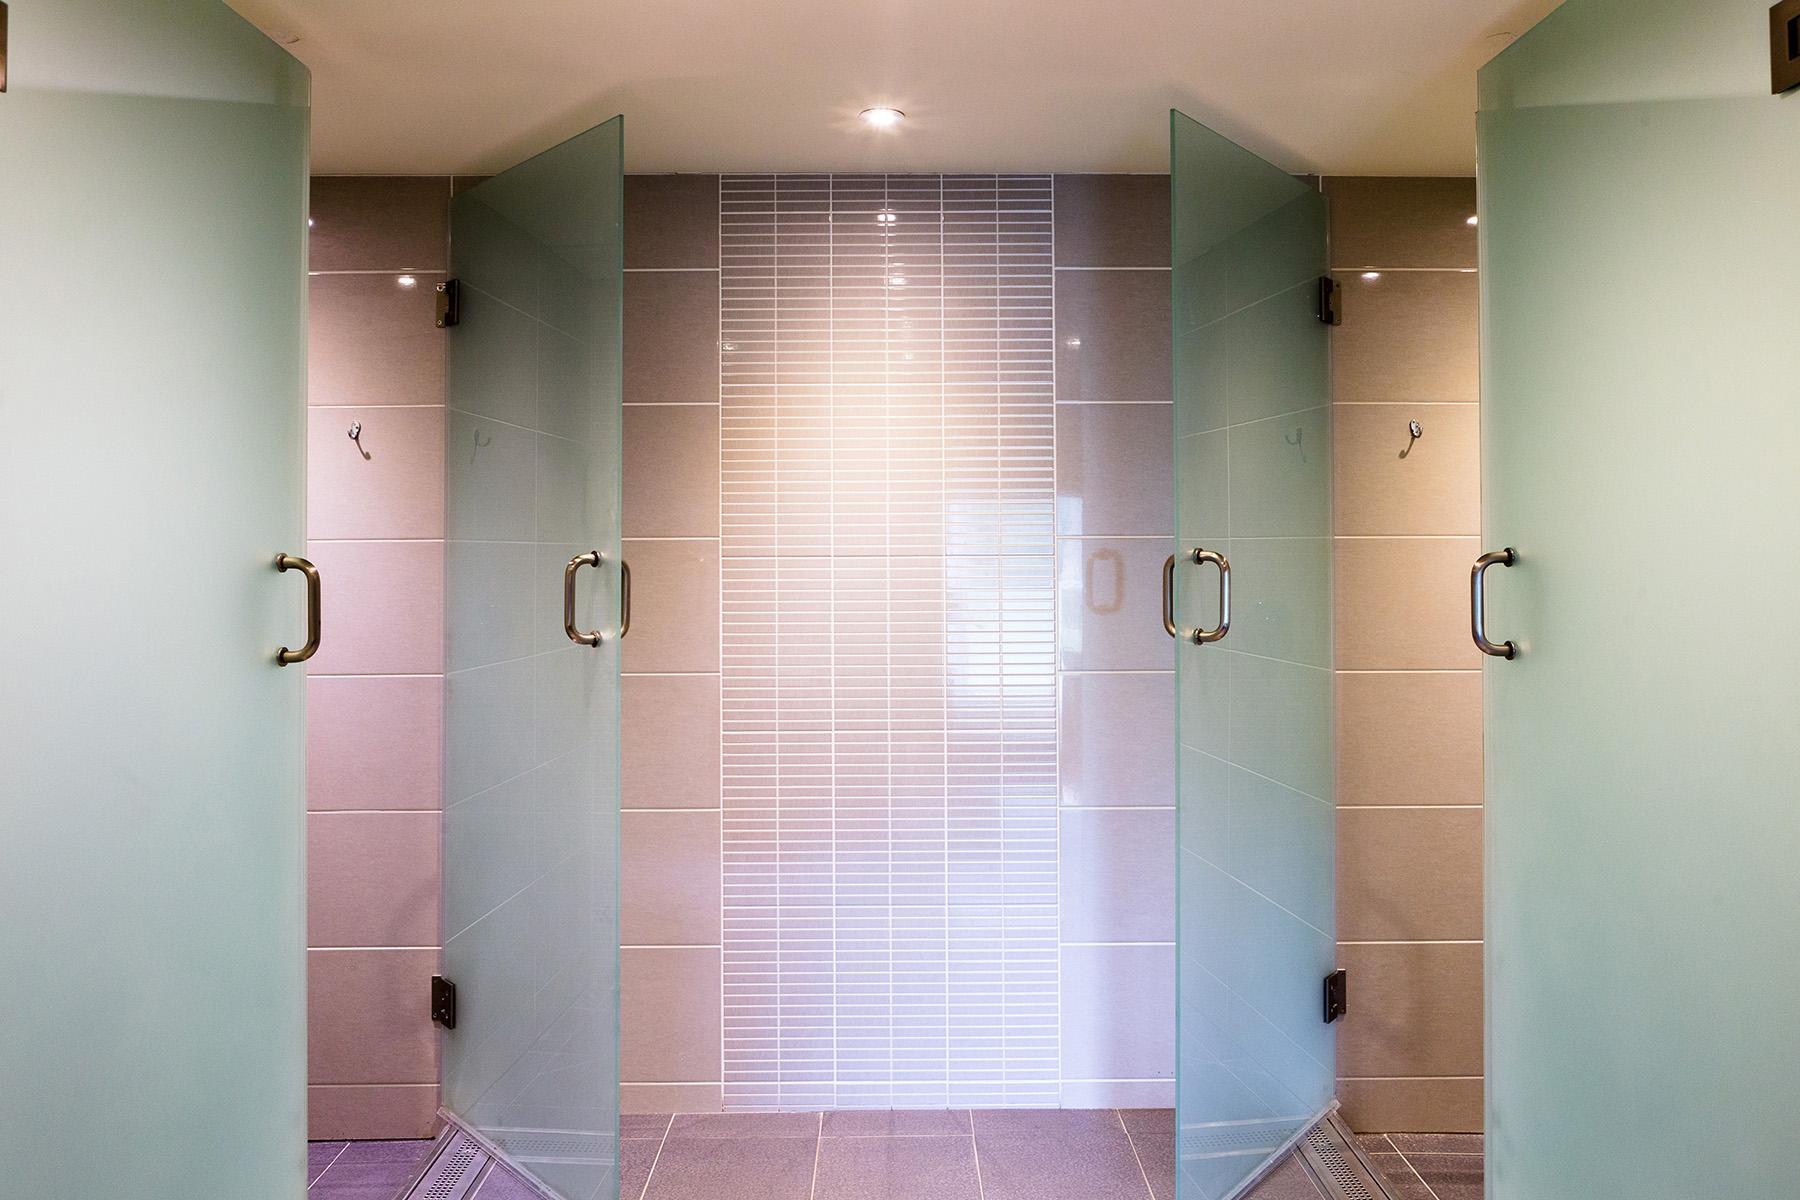 Huddersfield Golf Club Men's Visitors' Showers